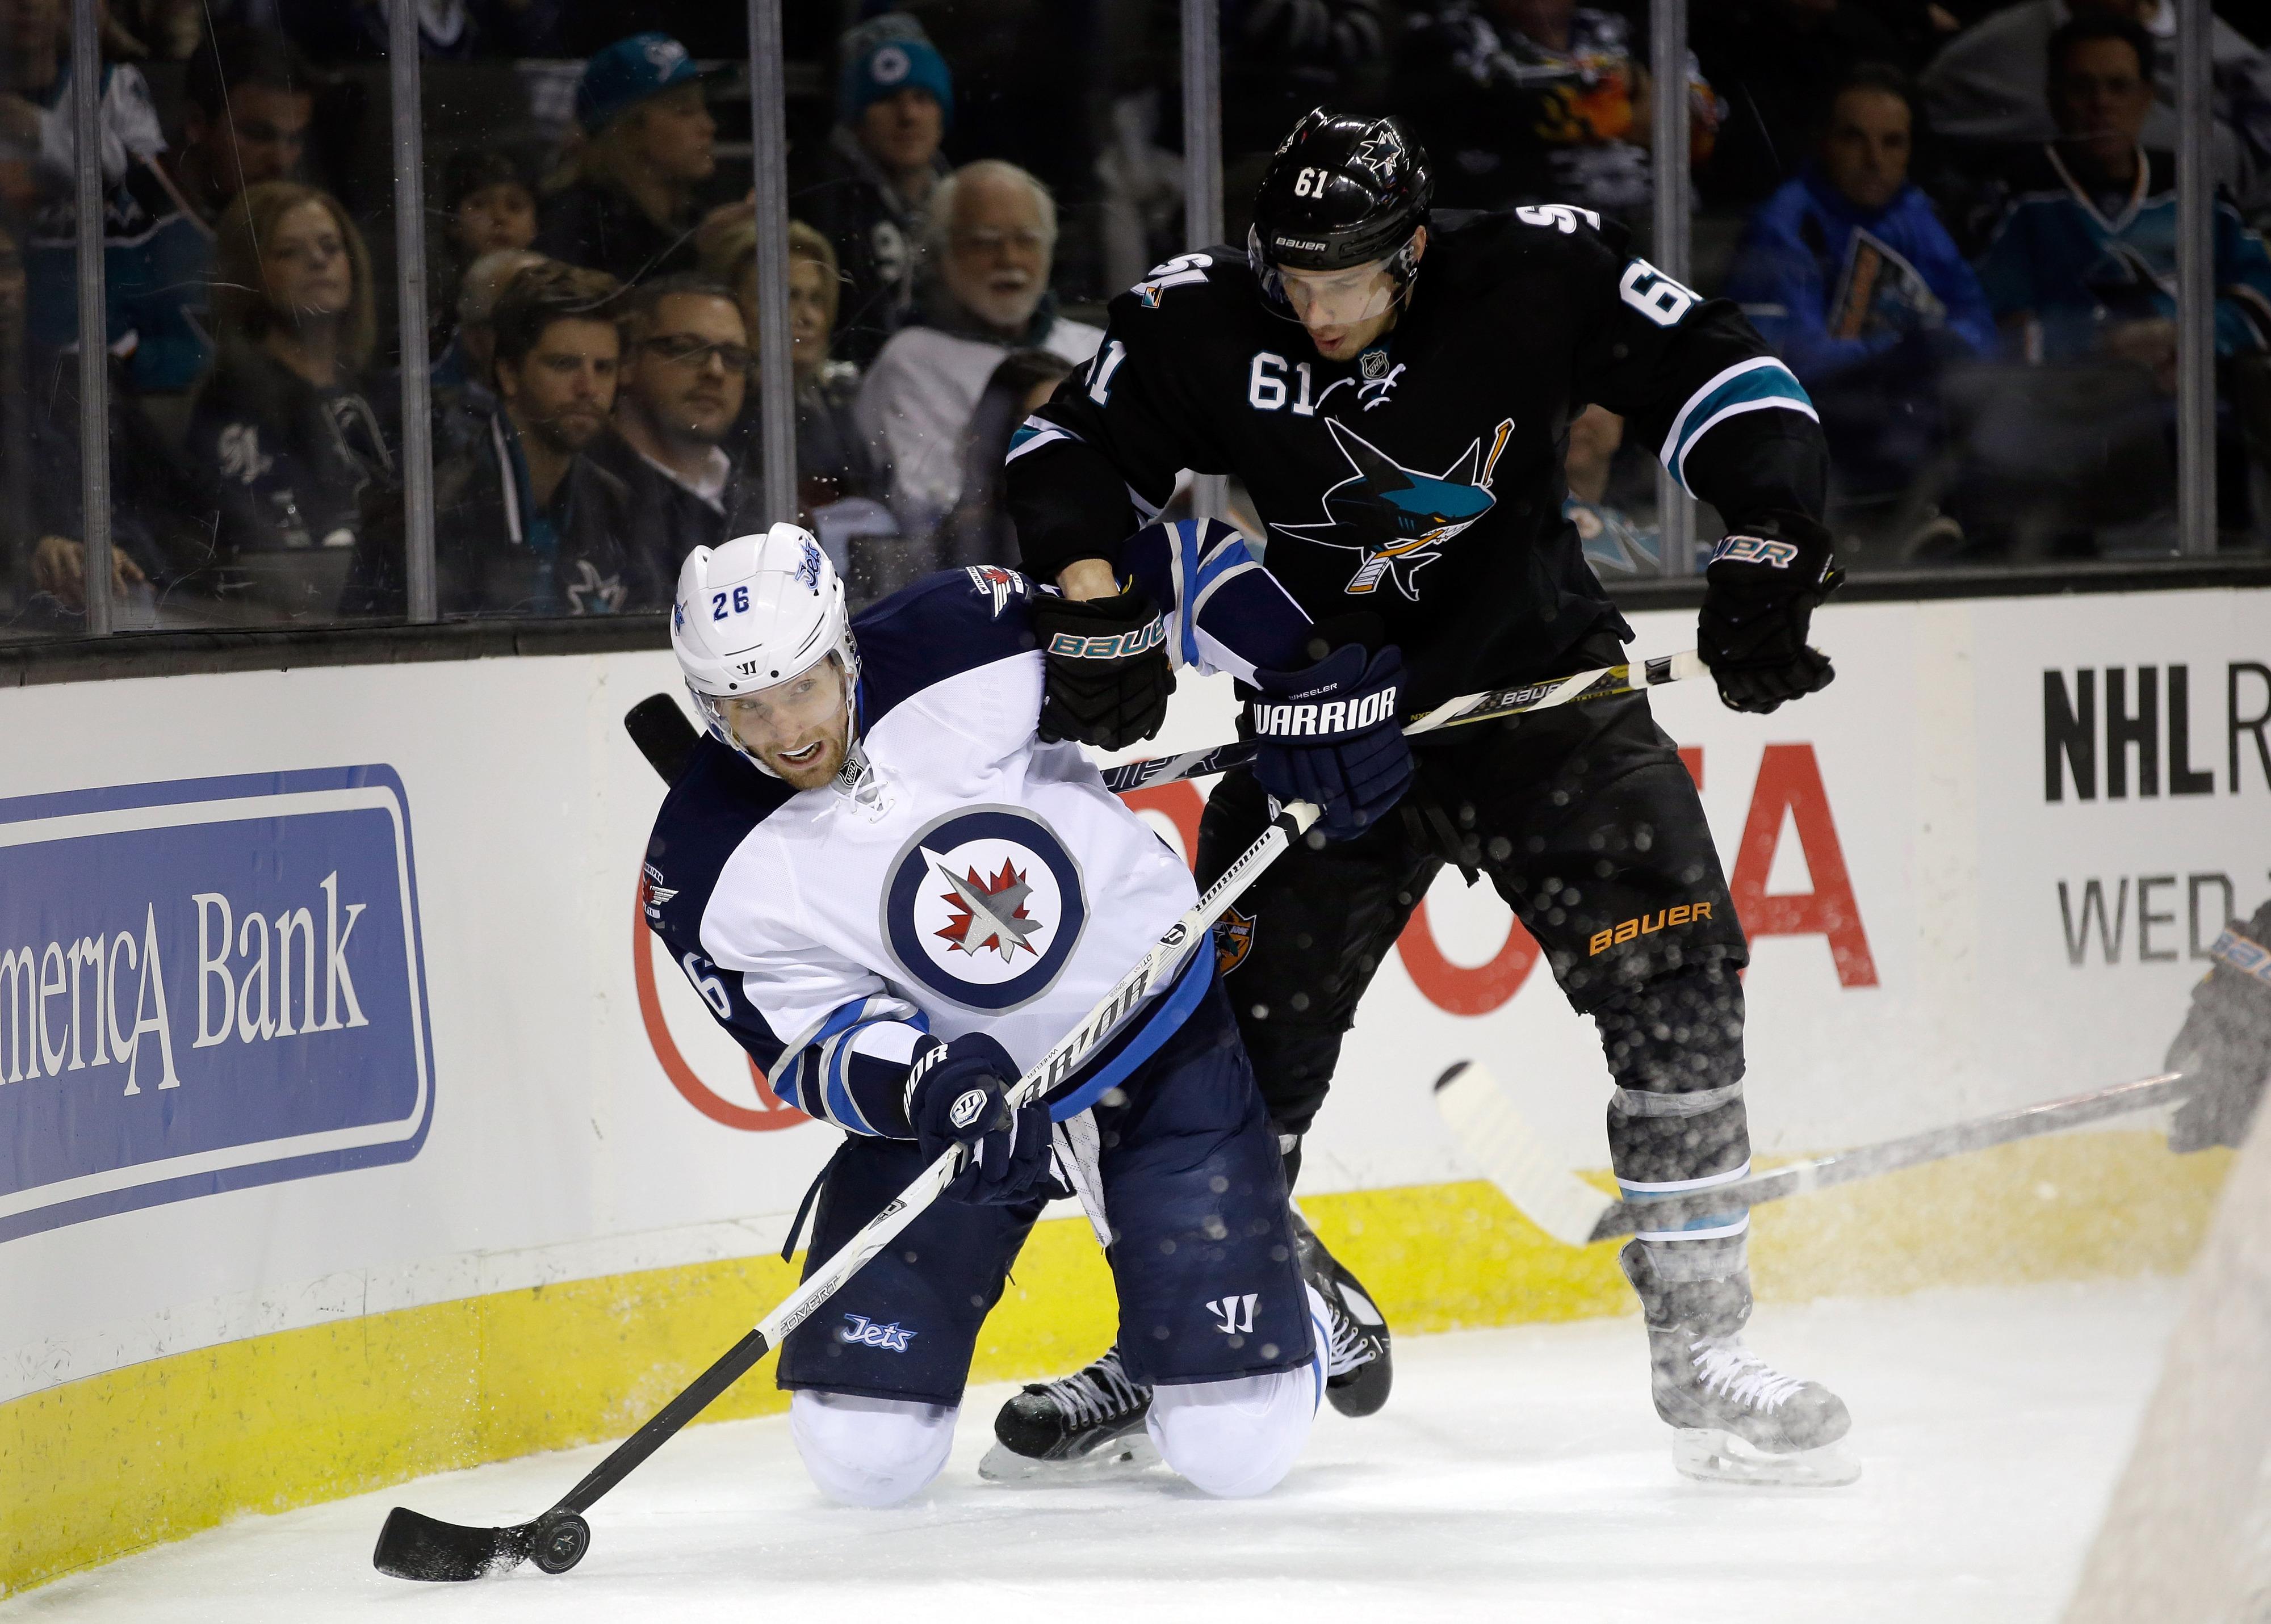 Sharks #61 Justin Braun battle Jets #26 Blake Wheeler for the puck